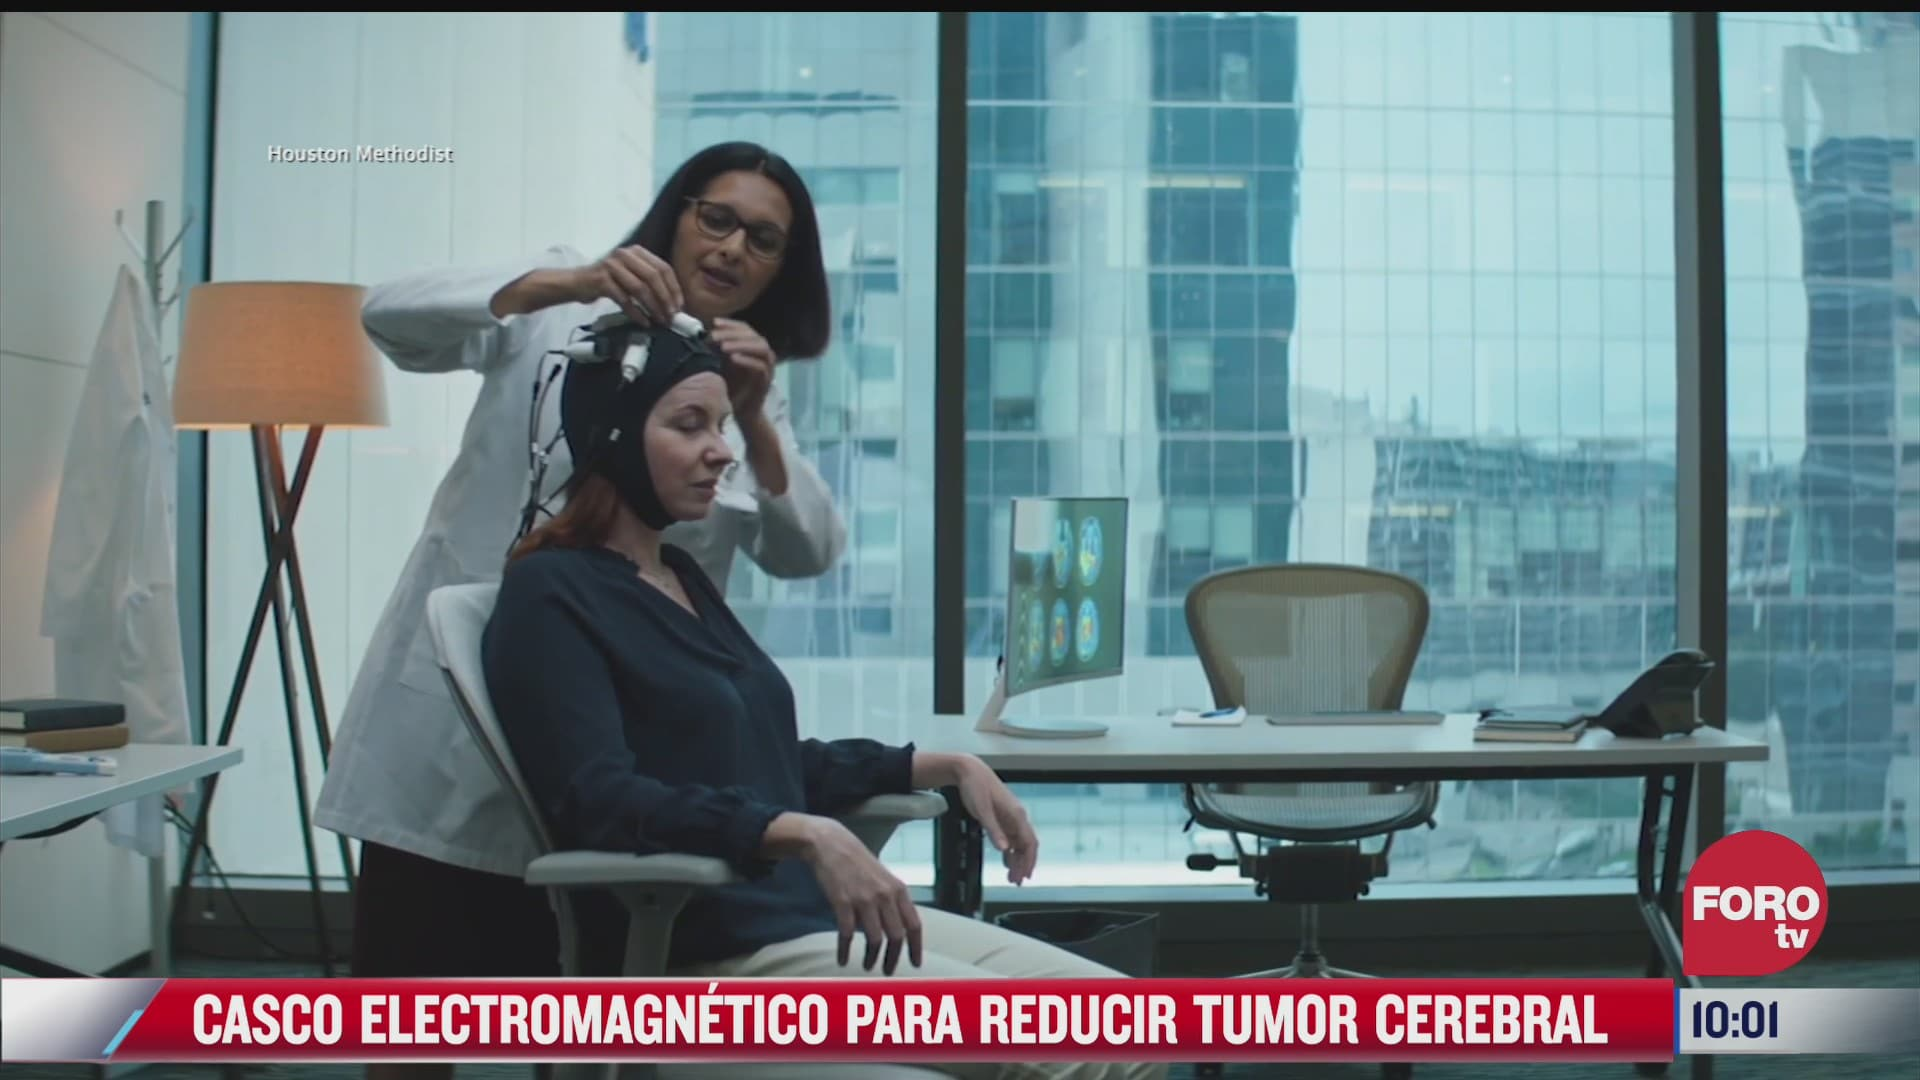 casco electromagnetico para reducir tumor cerebral